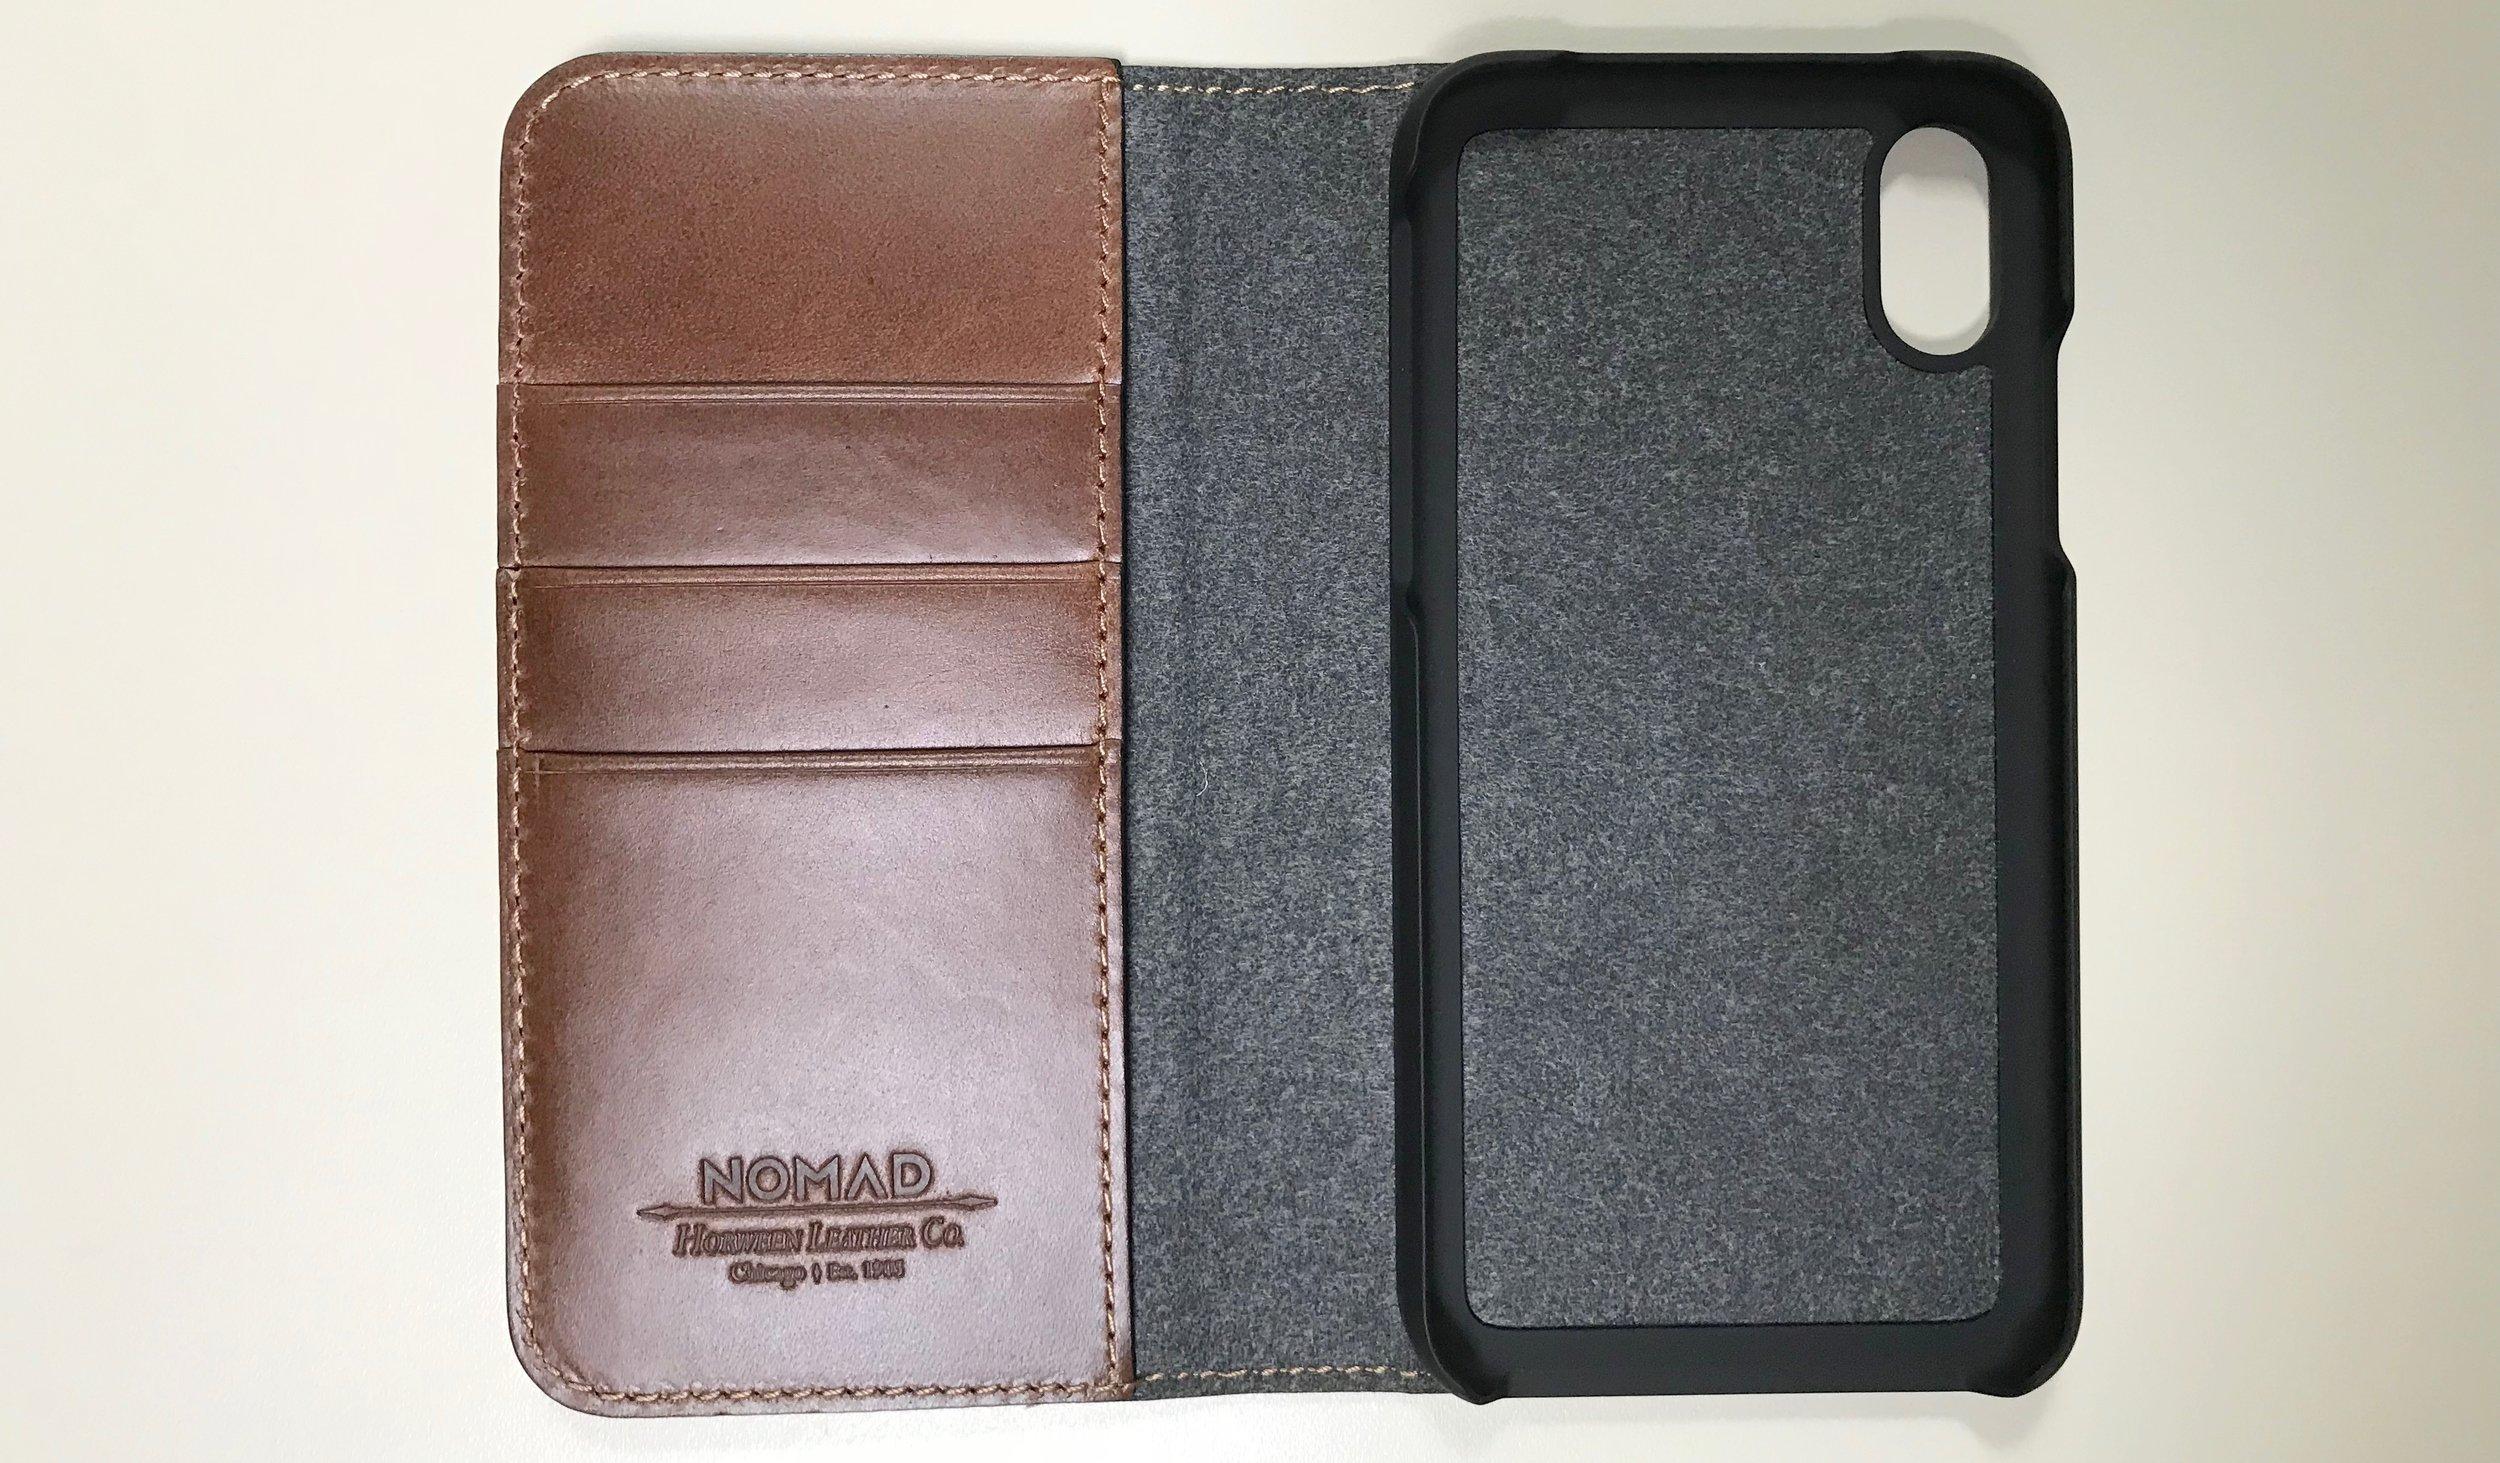 Nomad Leather Folio for iPhone X